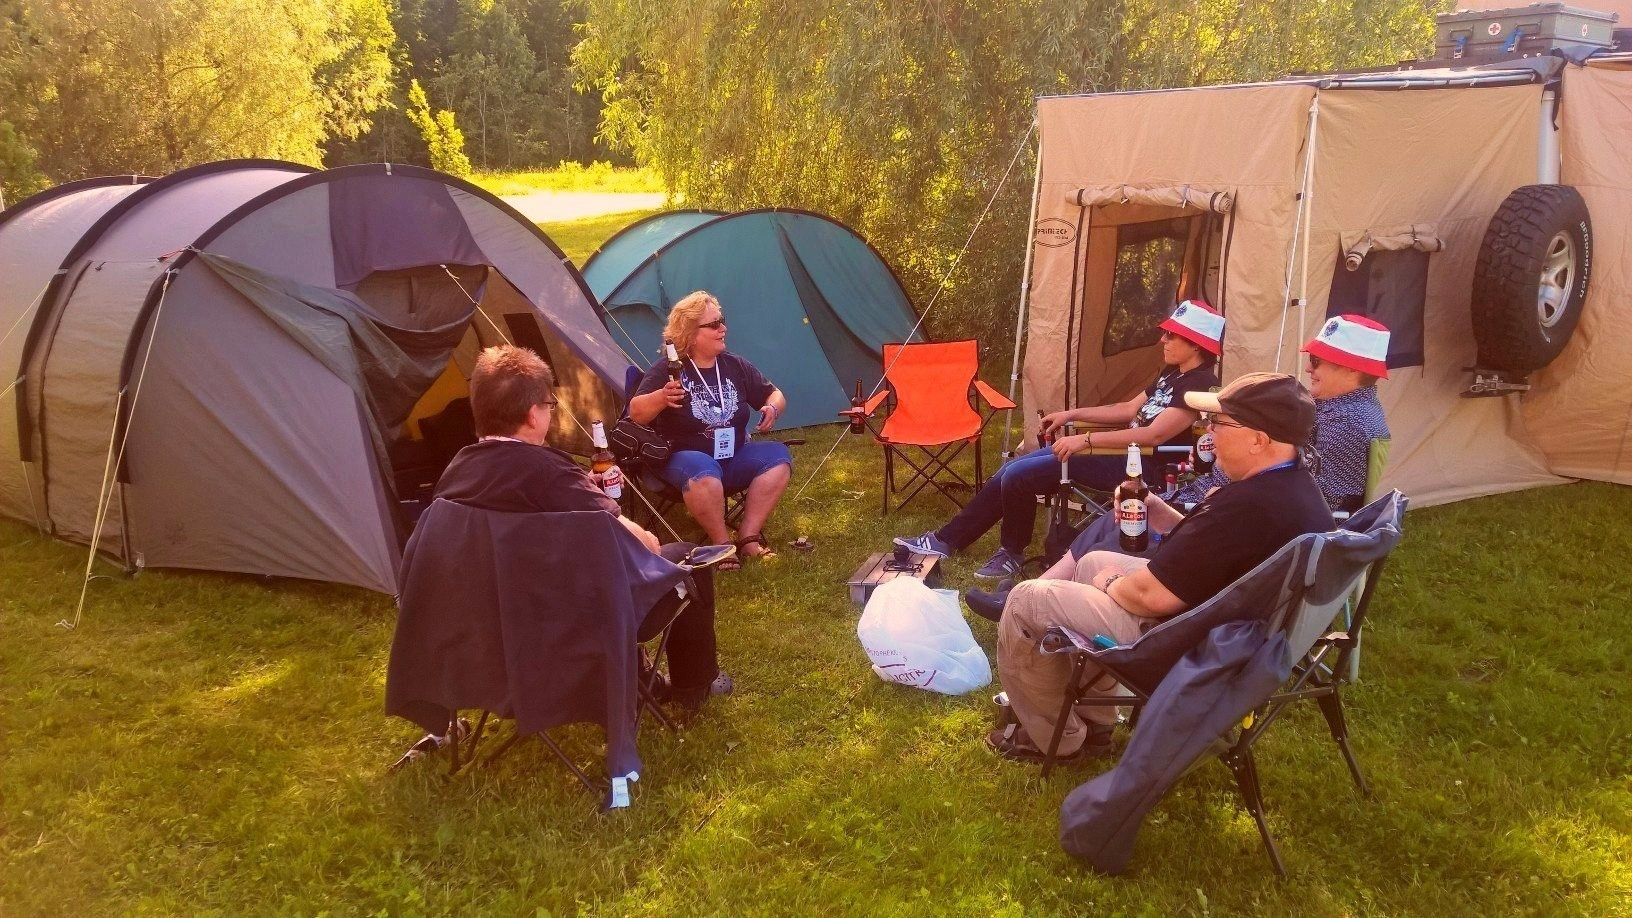 Wima Rally 2017 Austria Camp